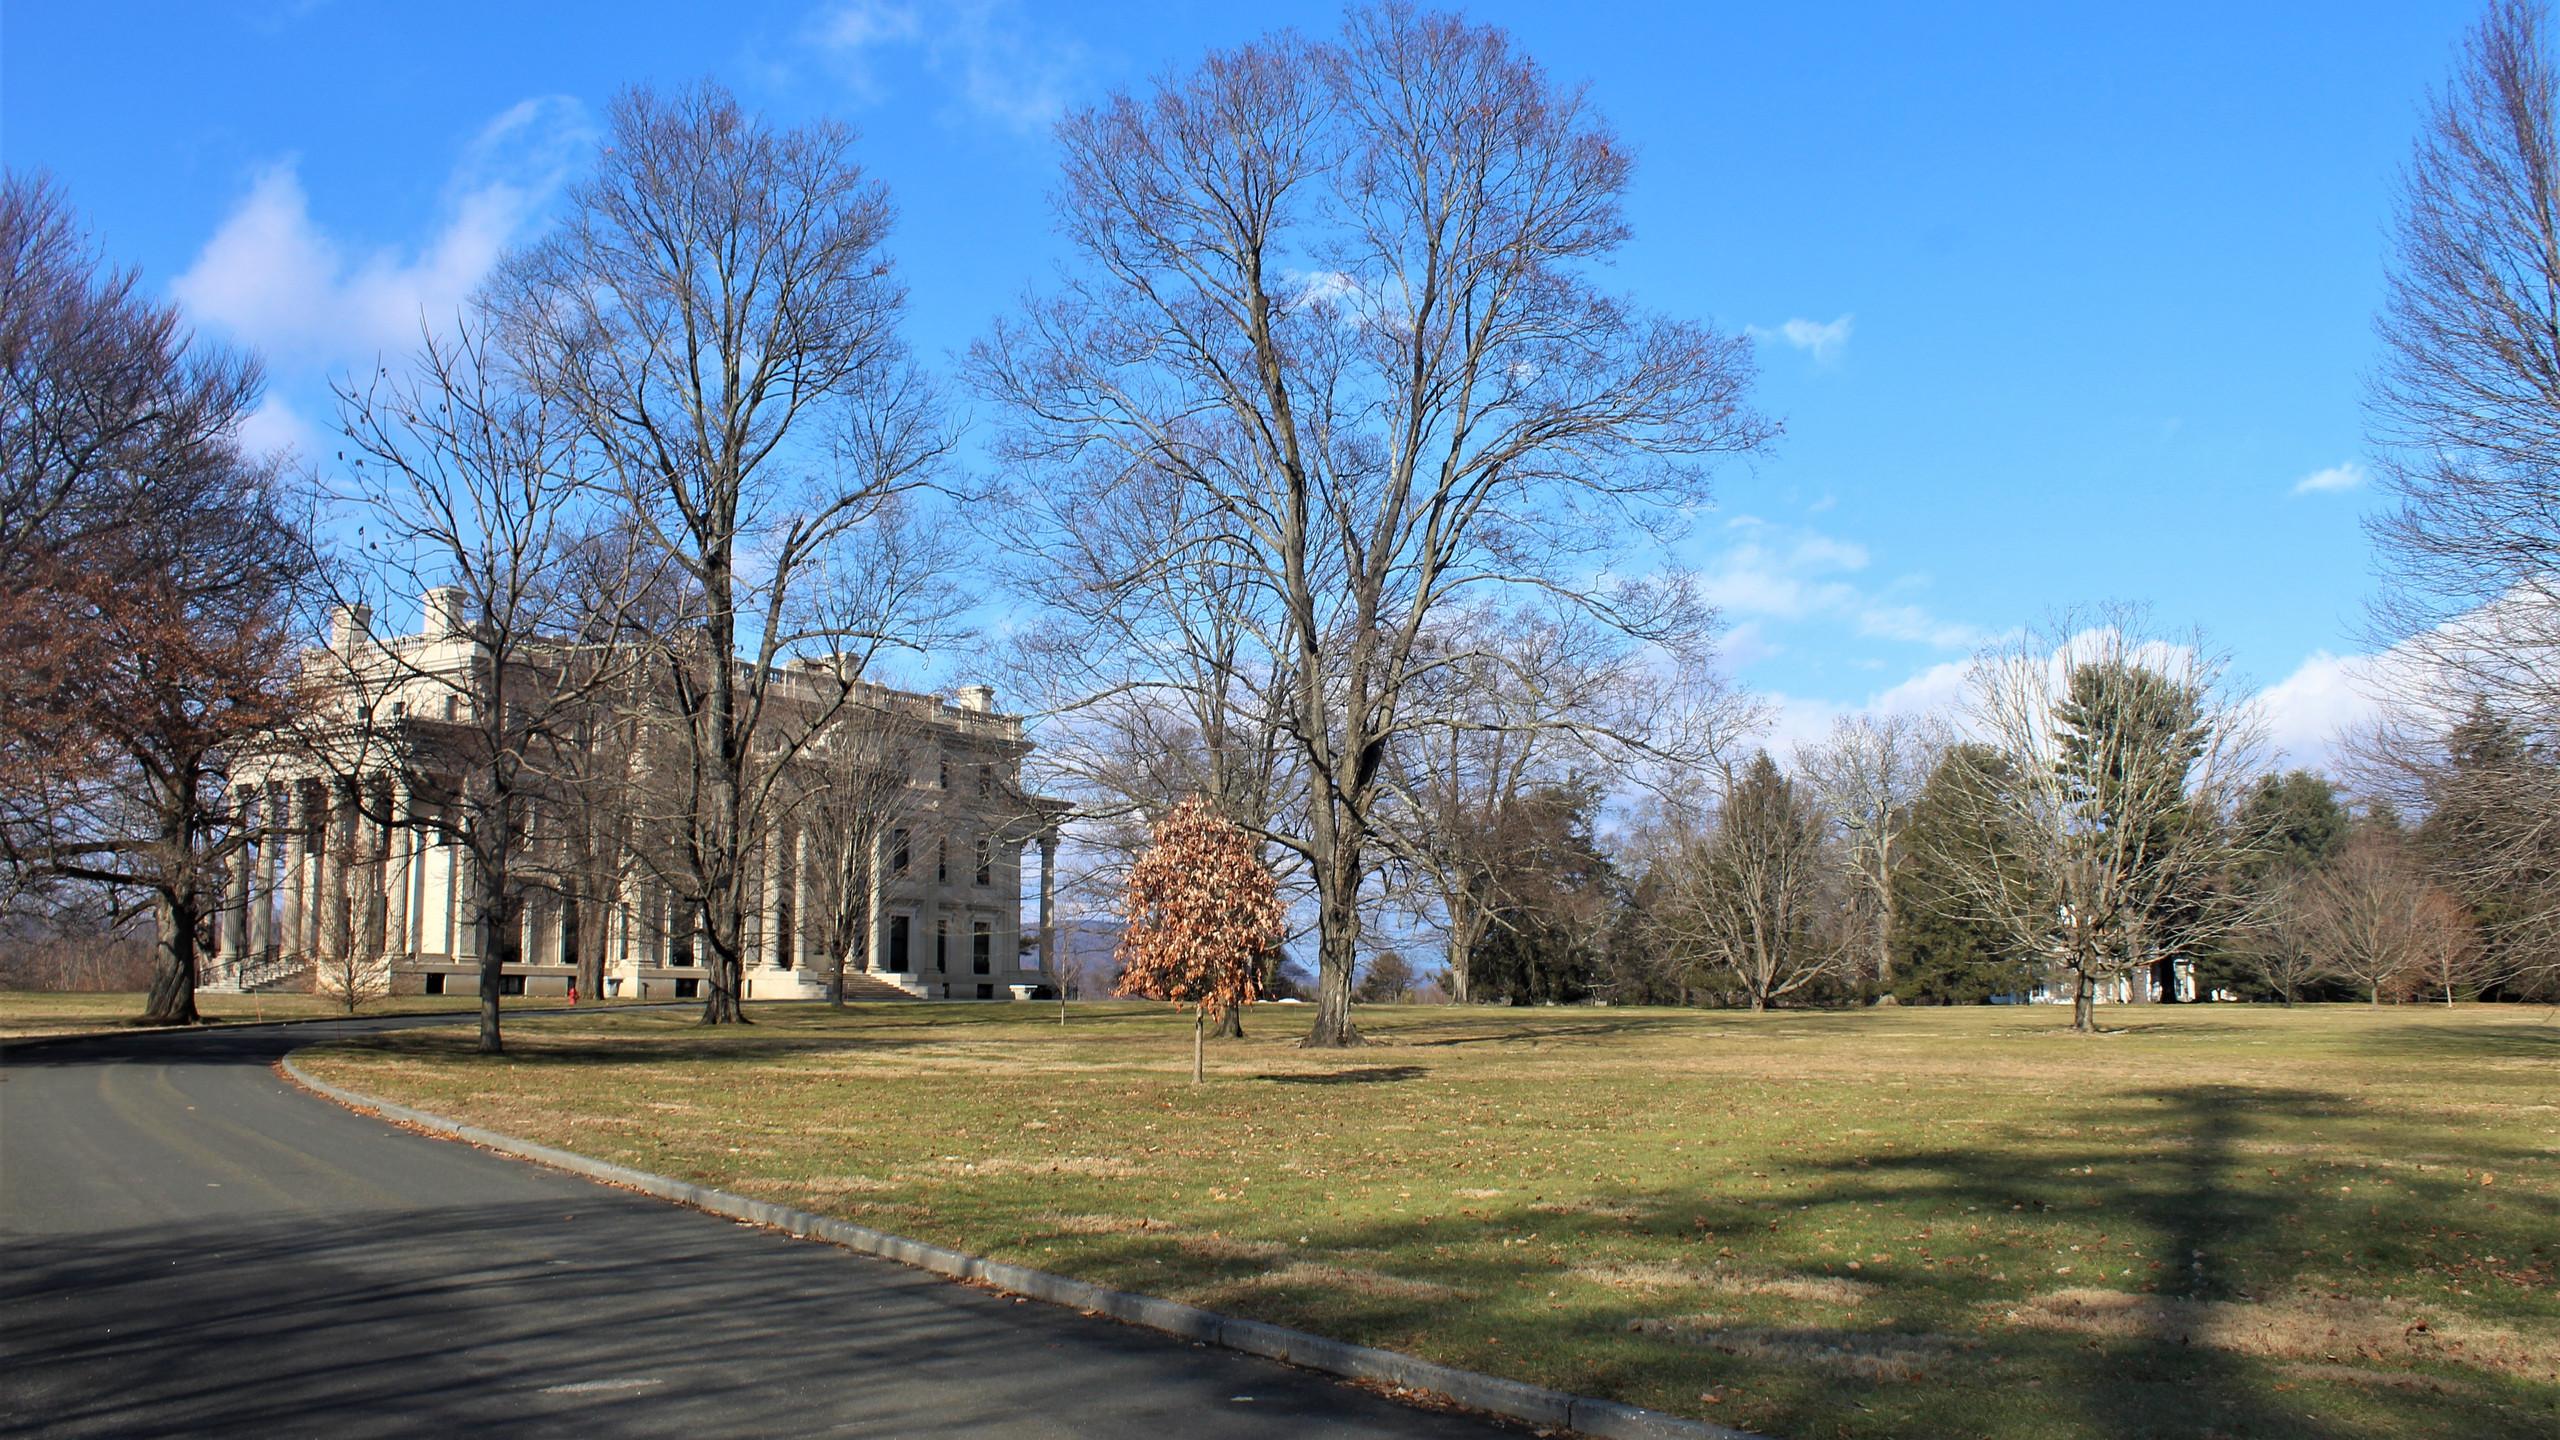 The Vanderbilt Estate